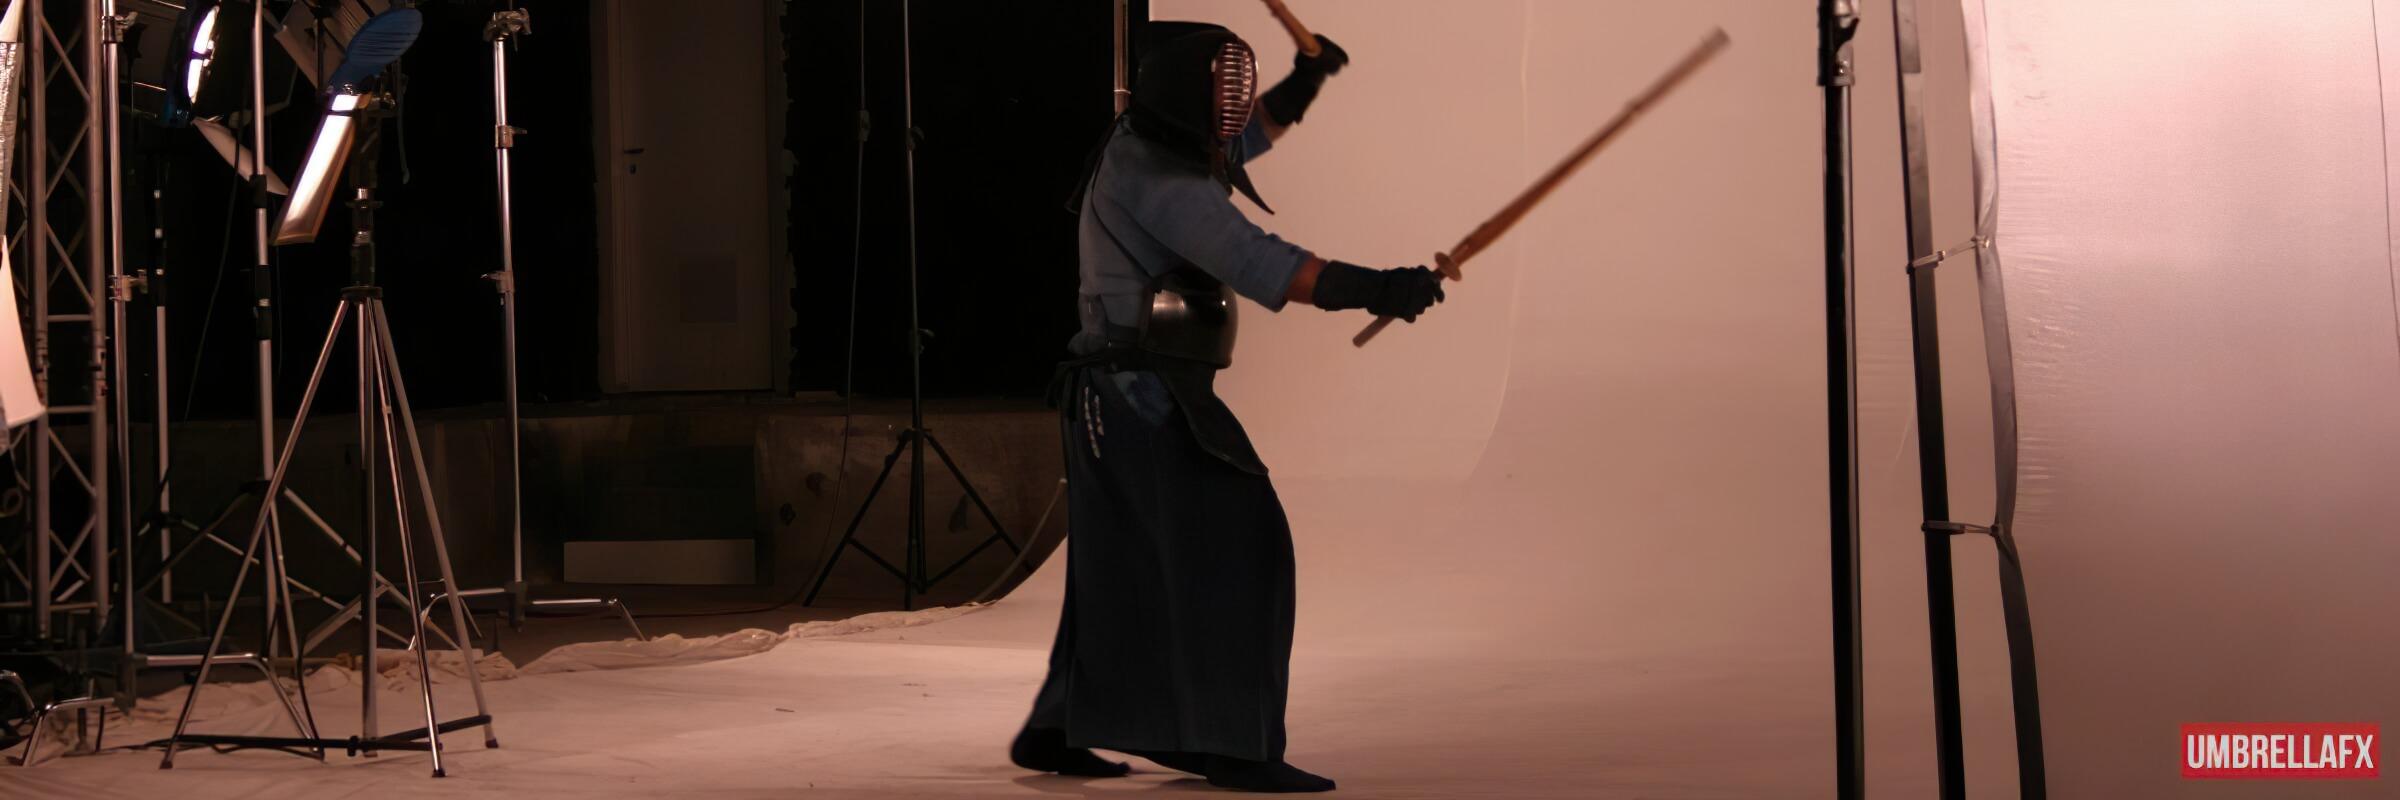 UmbrellaFX_On_the_Set_Boom_Action_04-1